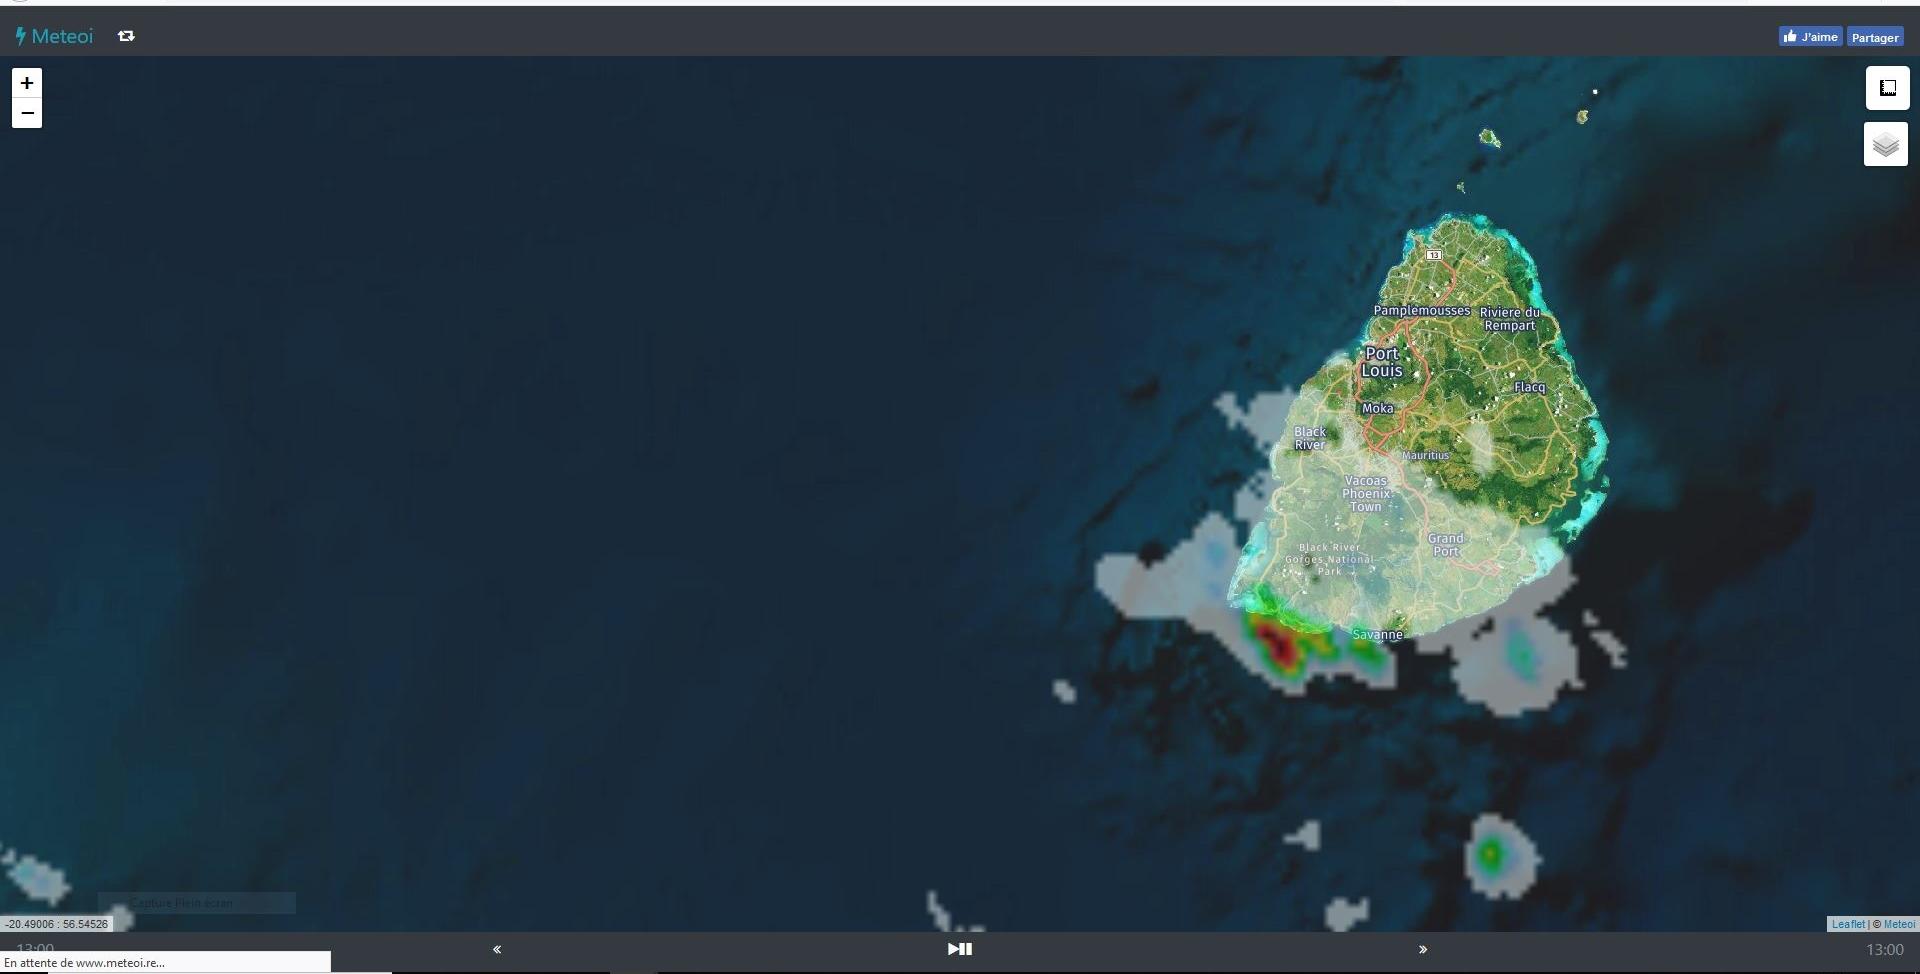 Image radar de 13h00. https://www.meteoi.re/